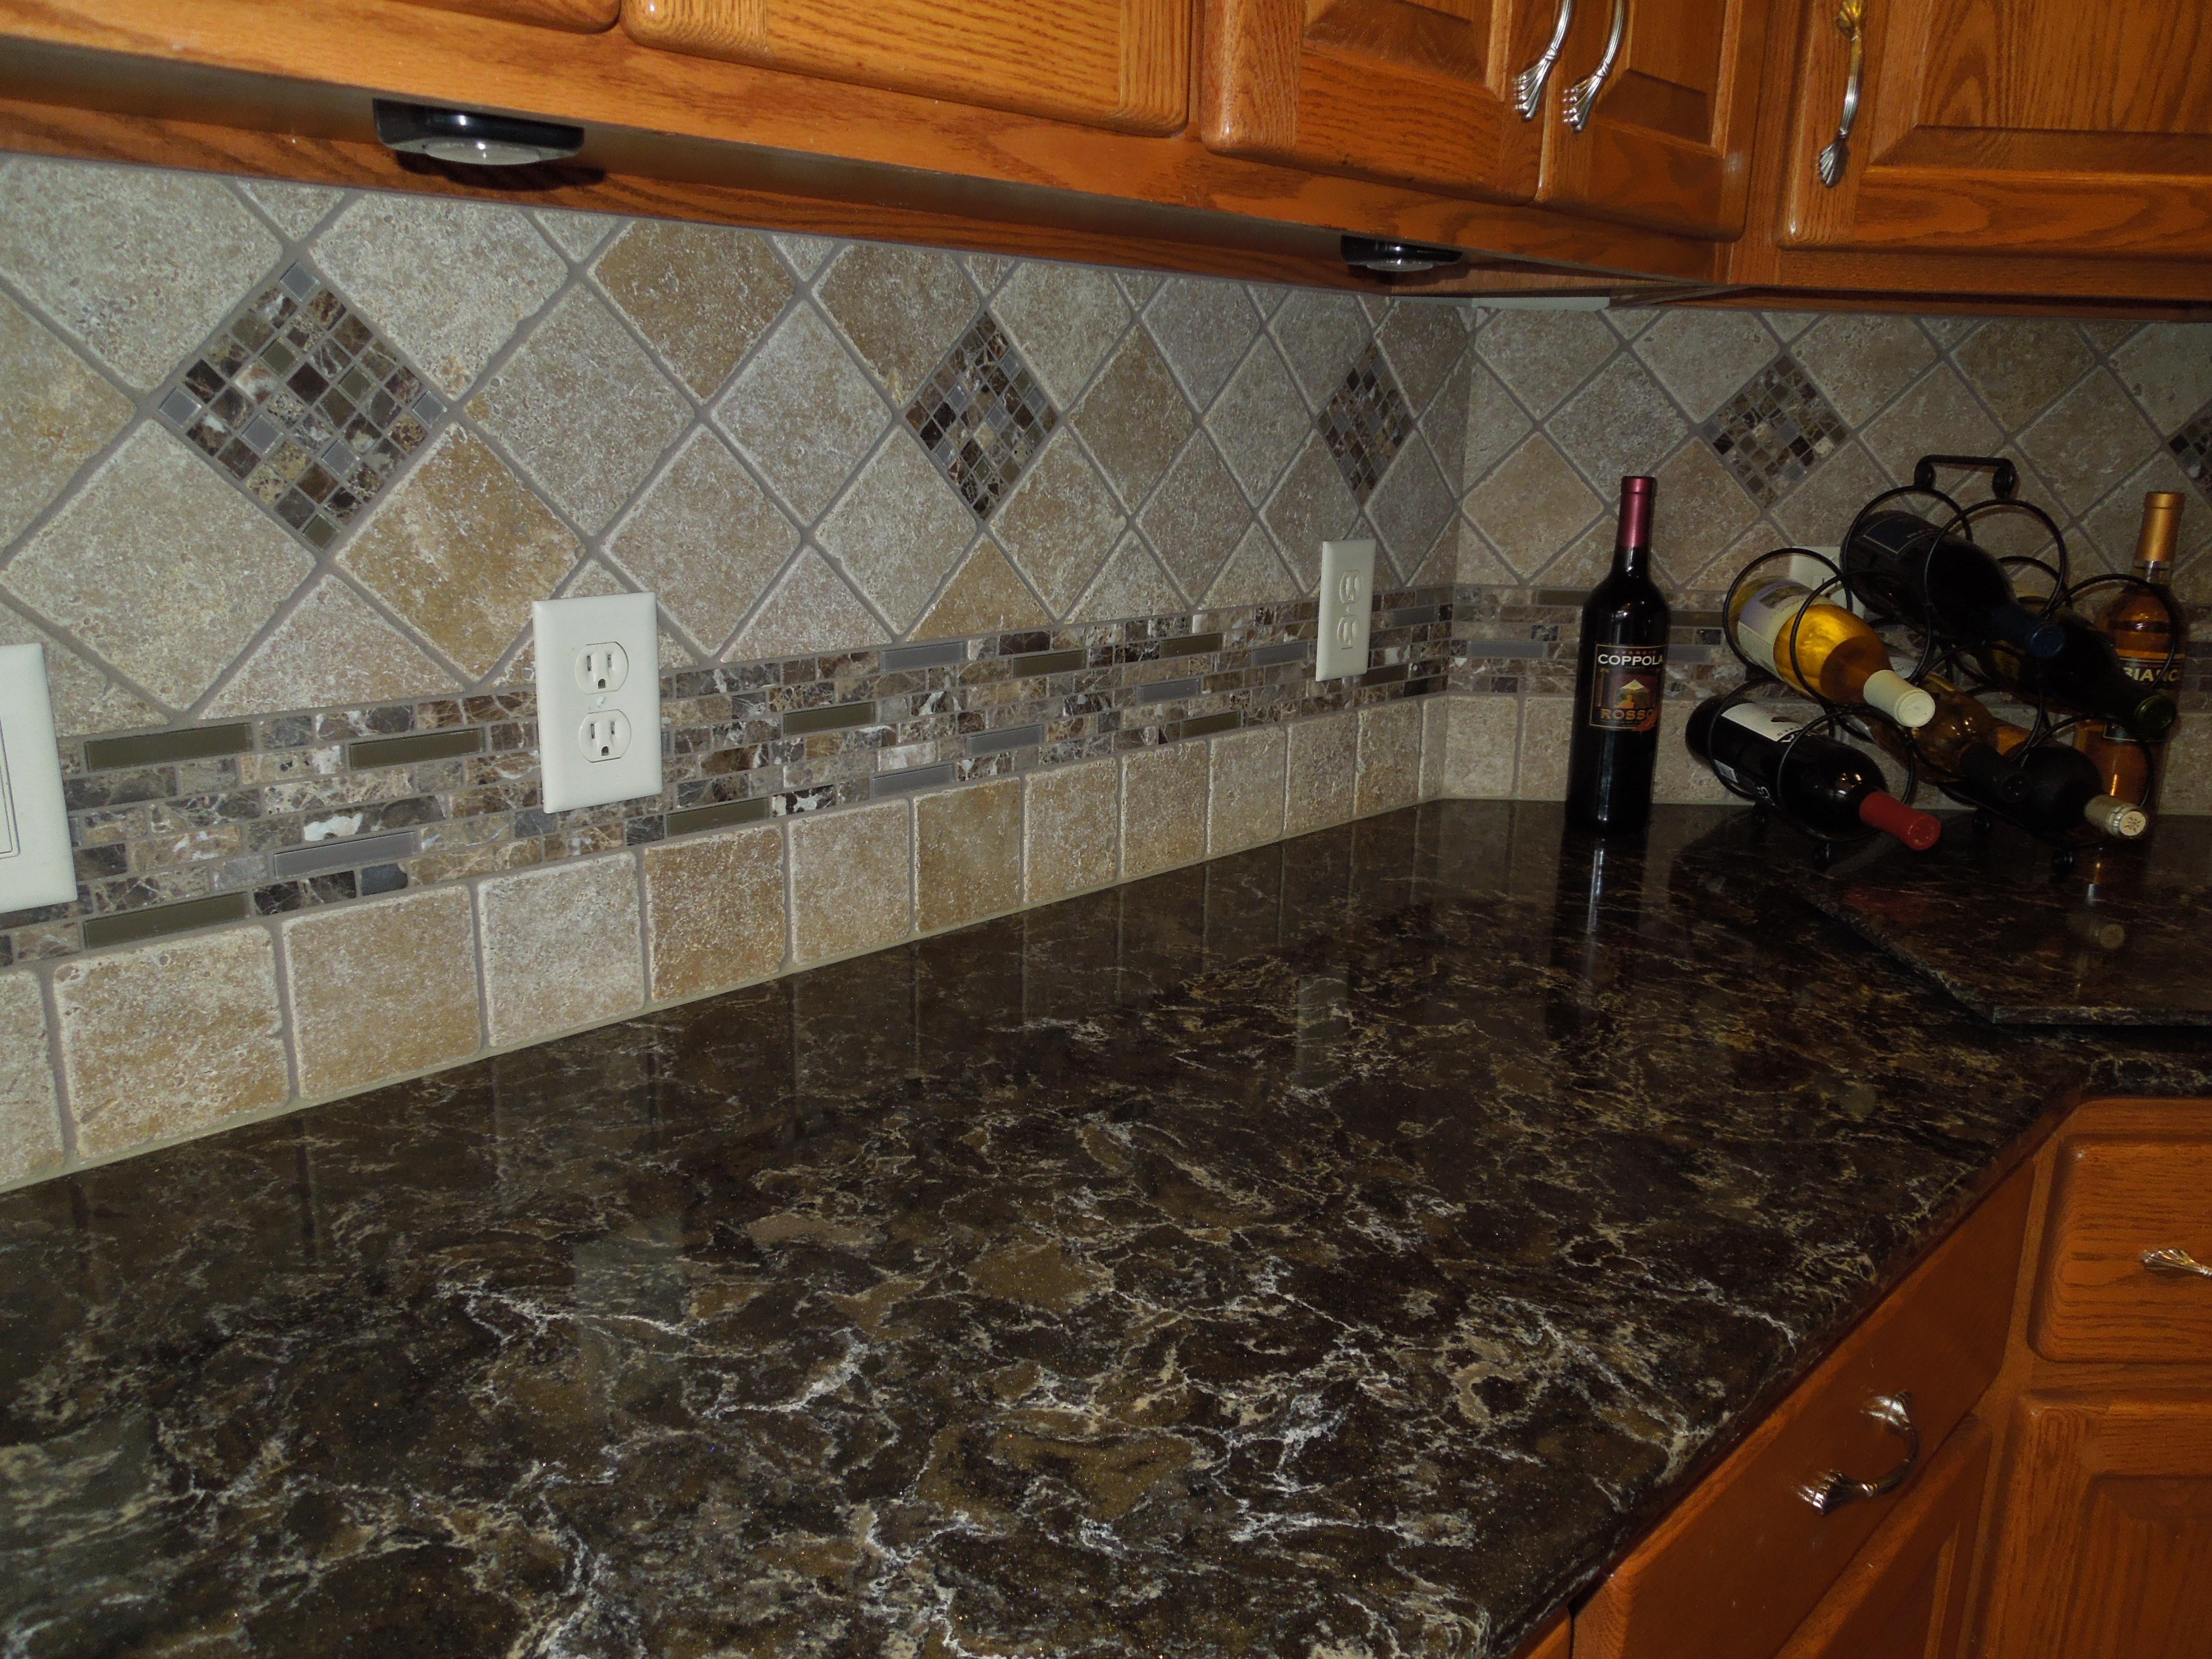 White Kitchen Sink Faucet Cambria Laneshaw Beautifies This Kitchen Creative